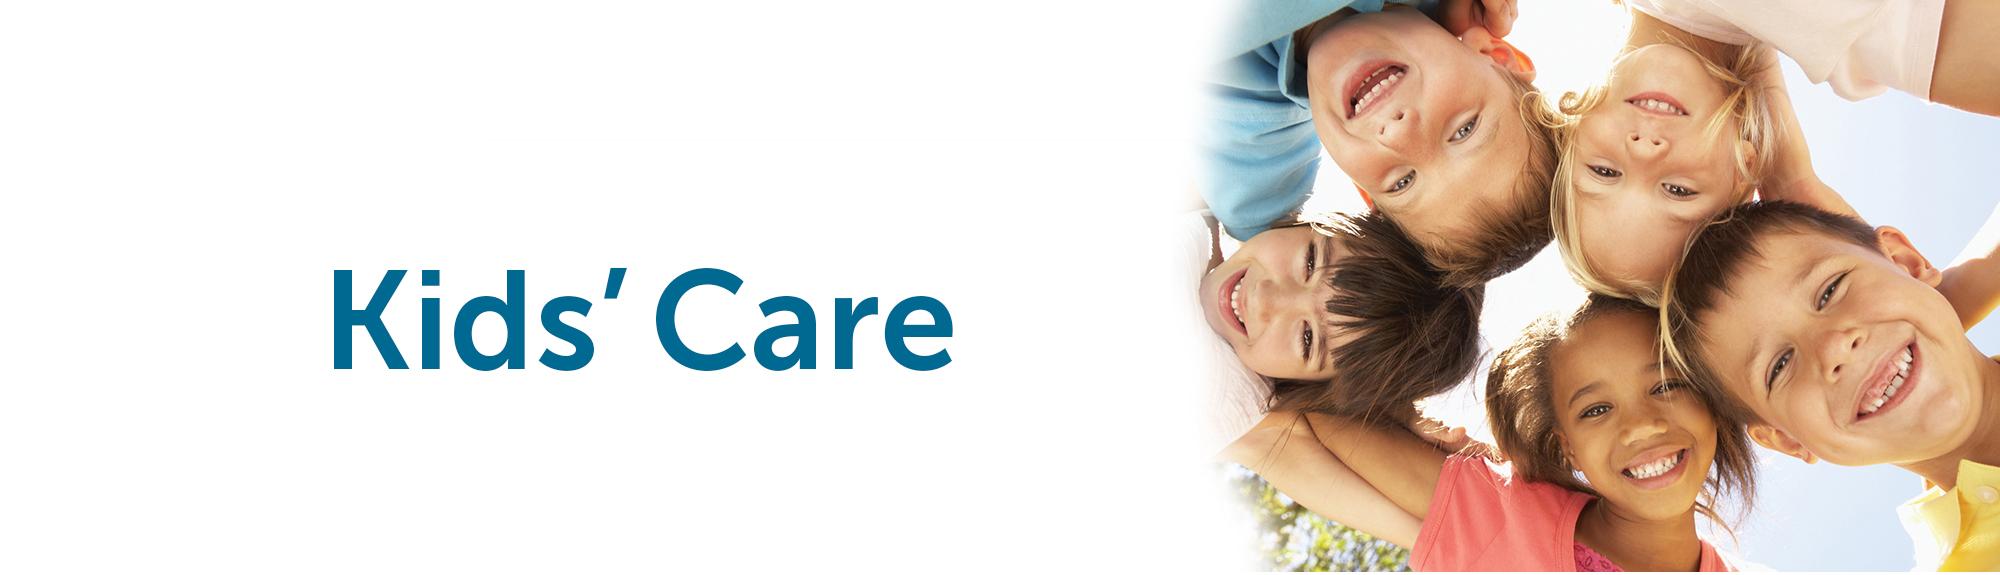 Kids Care Banner